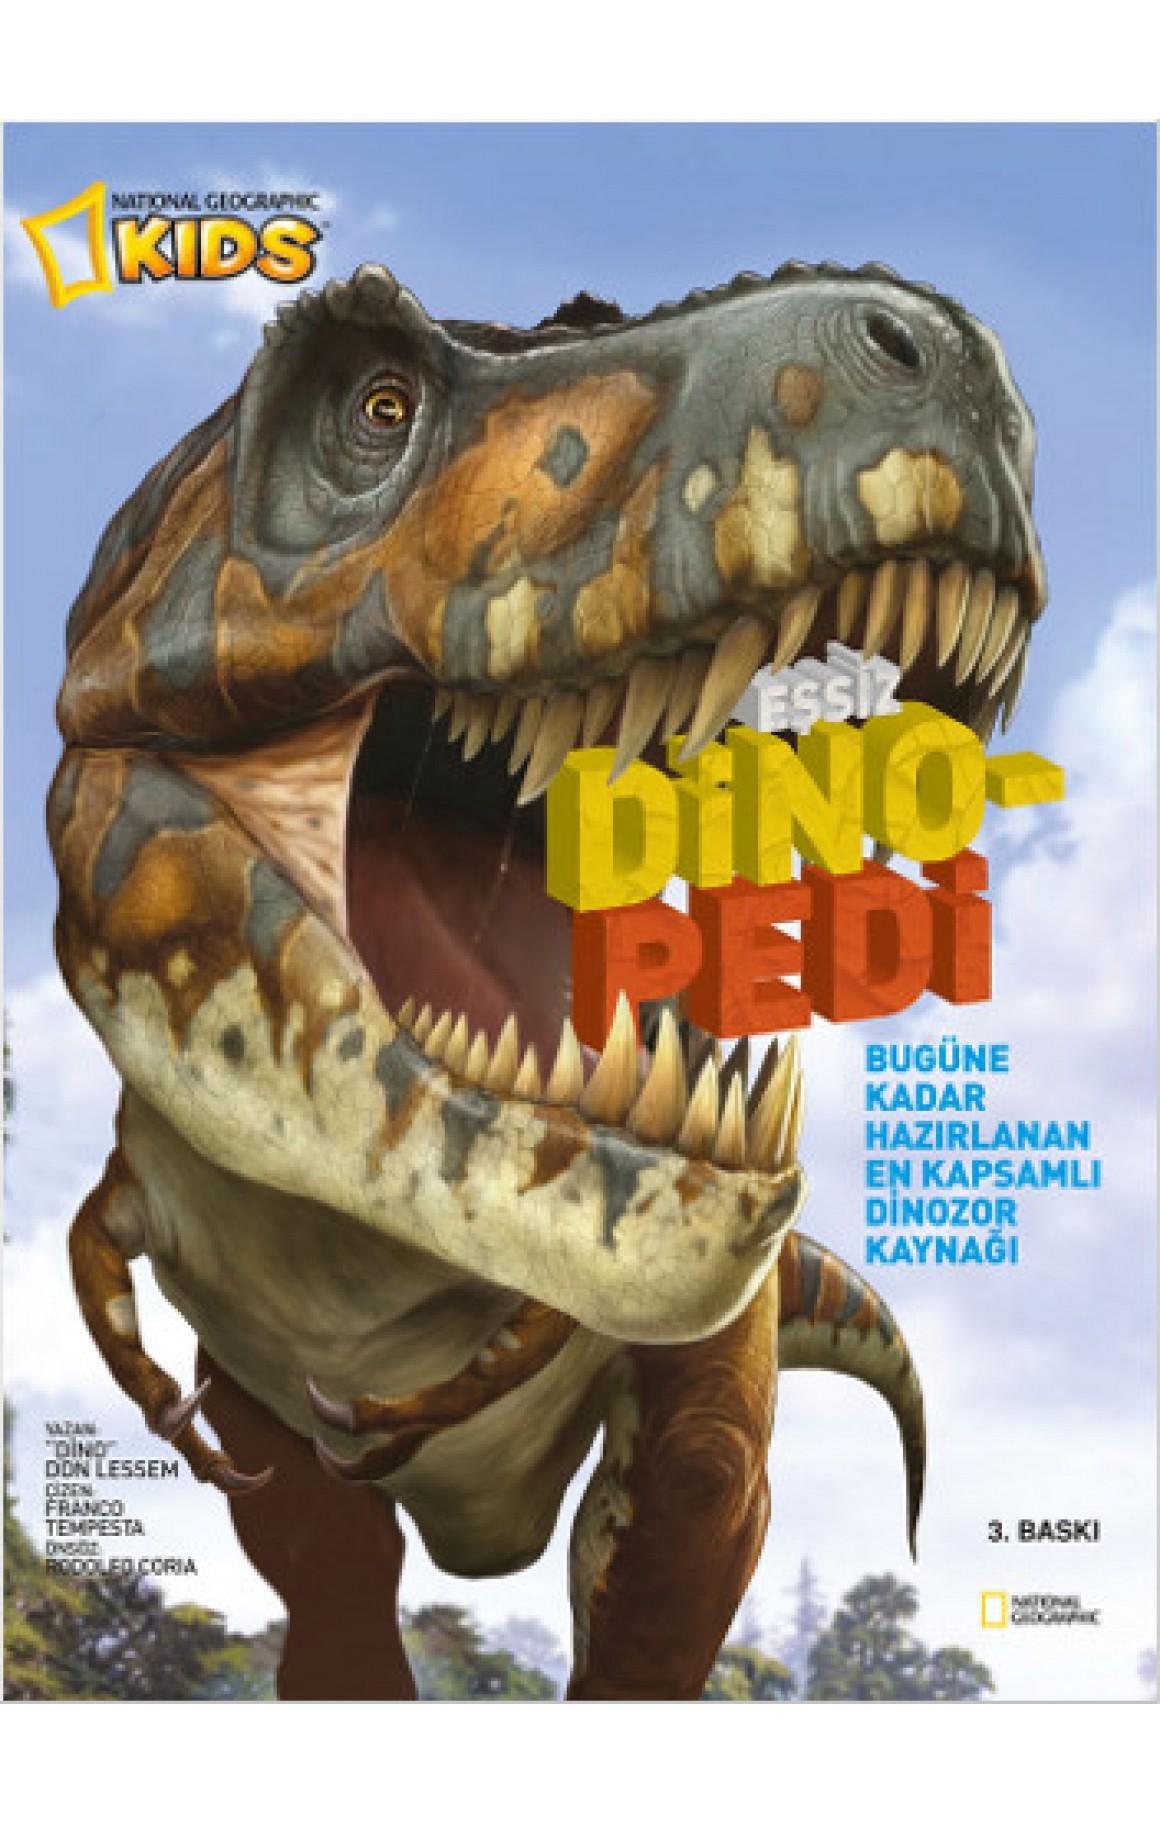 National Geographic Kids - Eşsiz Dinopedi